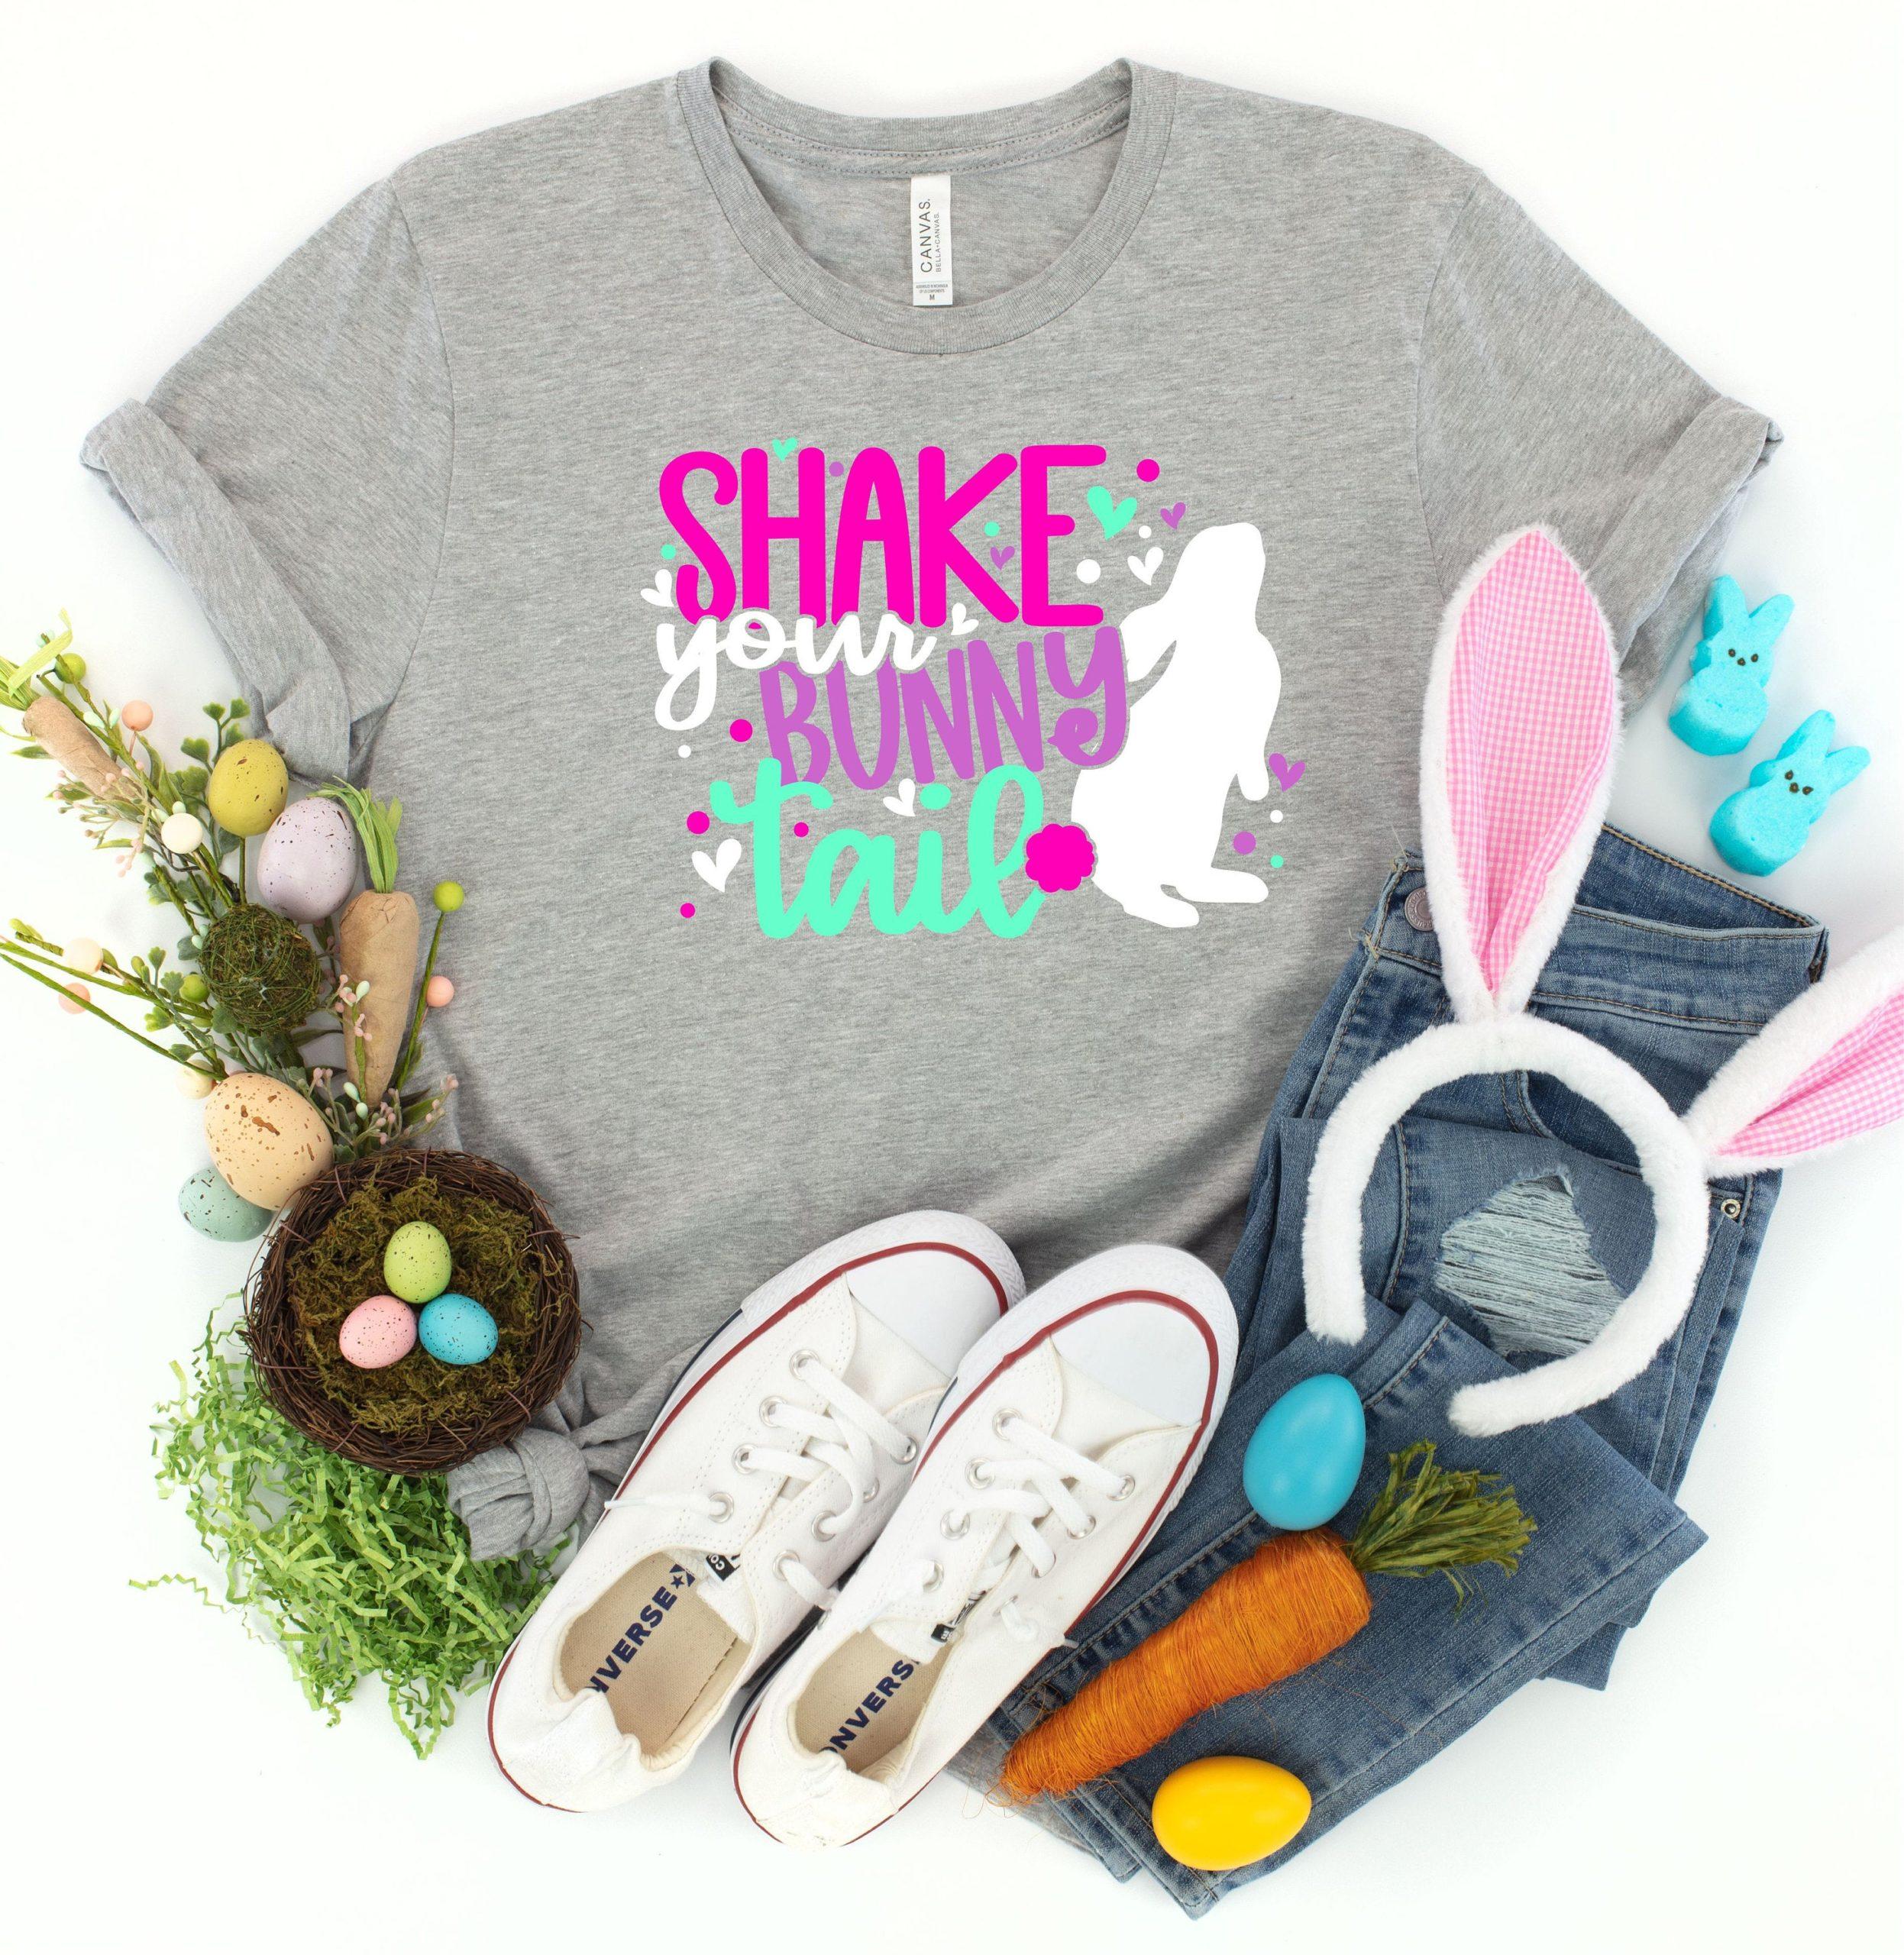 Easter-svg-shake-your-bunny-tail-svg-bunny-tail-svg-bunny-svg-jesus-svg-easter-svg-design-easter-cut-file-easter-cricut-svg-cricut-6051299d